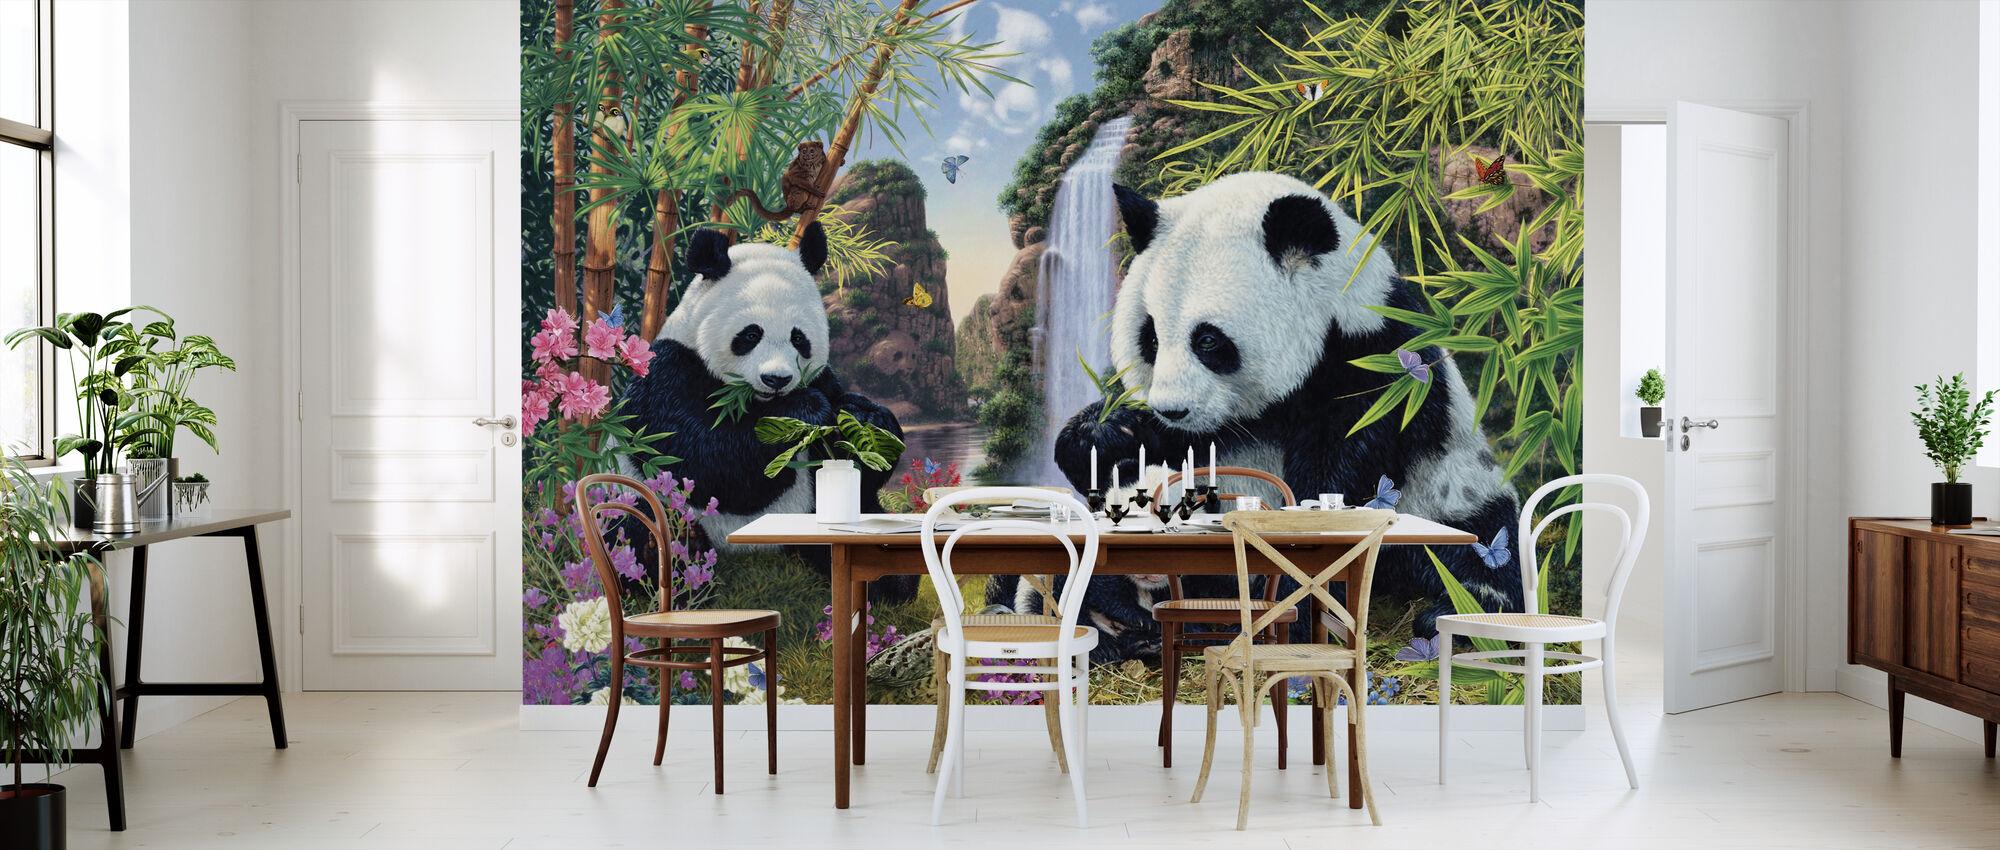 Panda Valley - Wallpaper - Kitchen